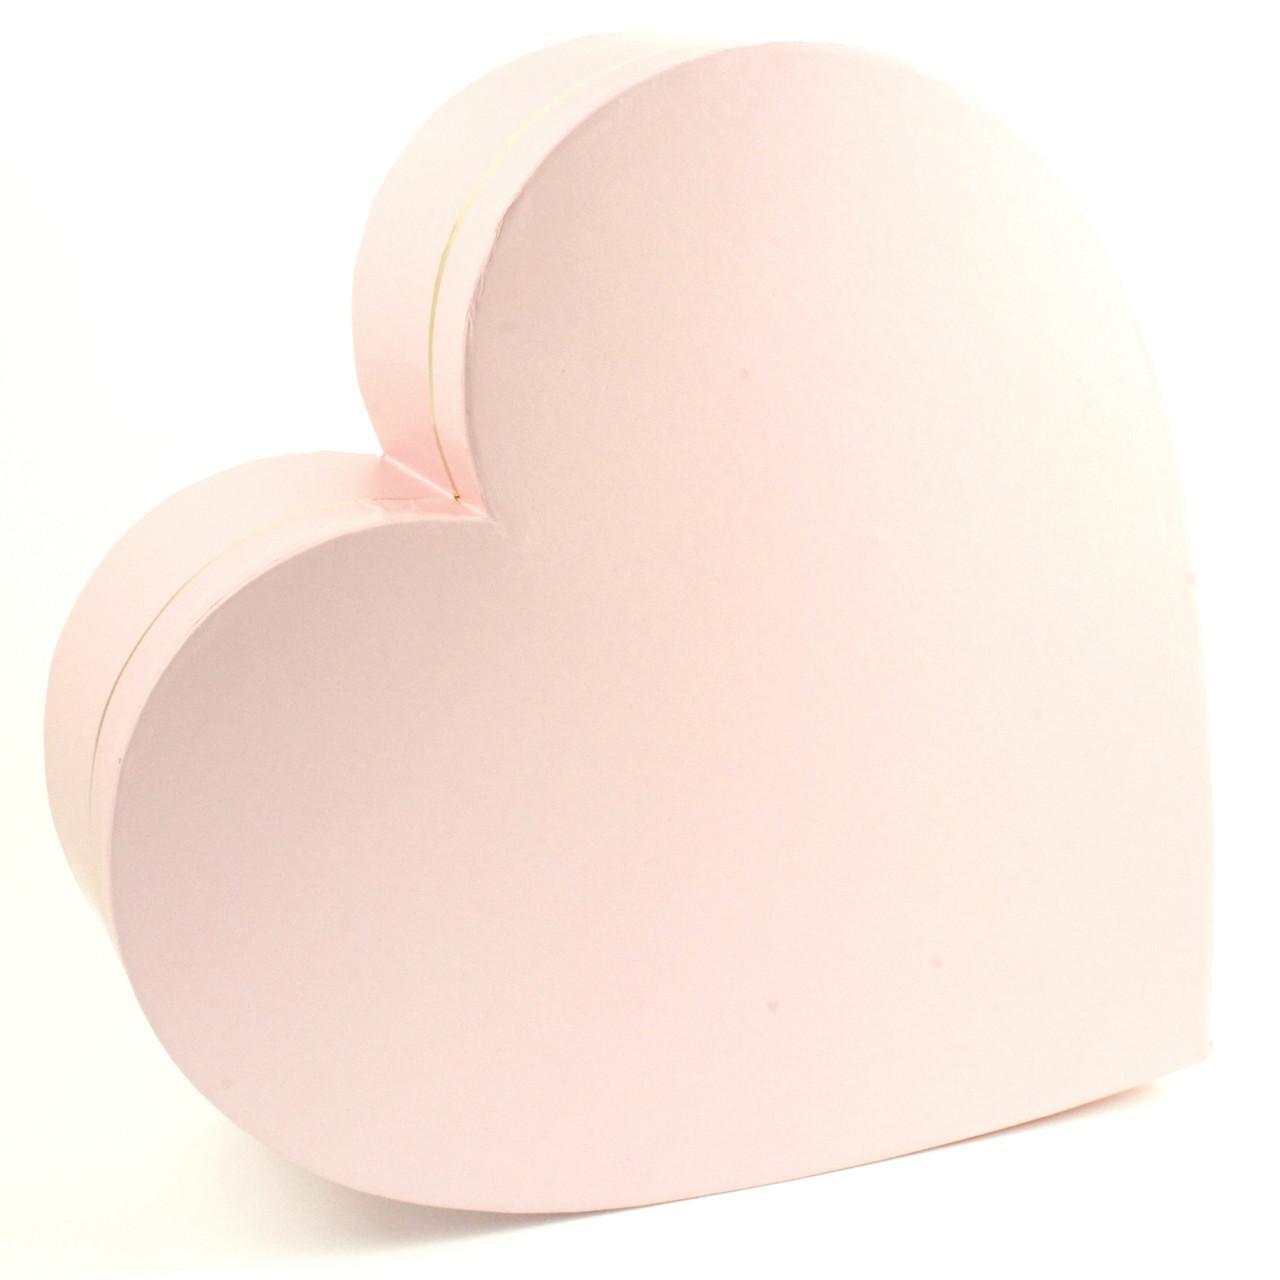 Подарочная коробка Сердце розовая с золотом 33 x 32.5 x 11.5 см